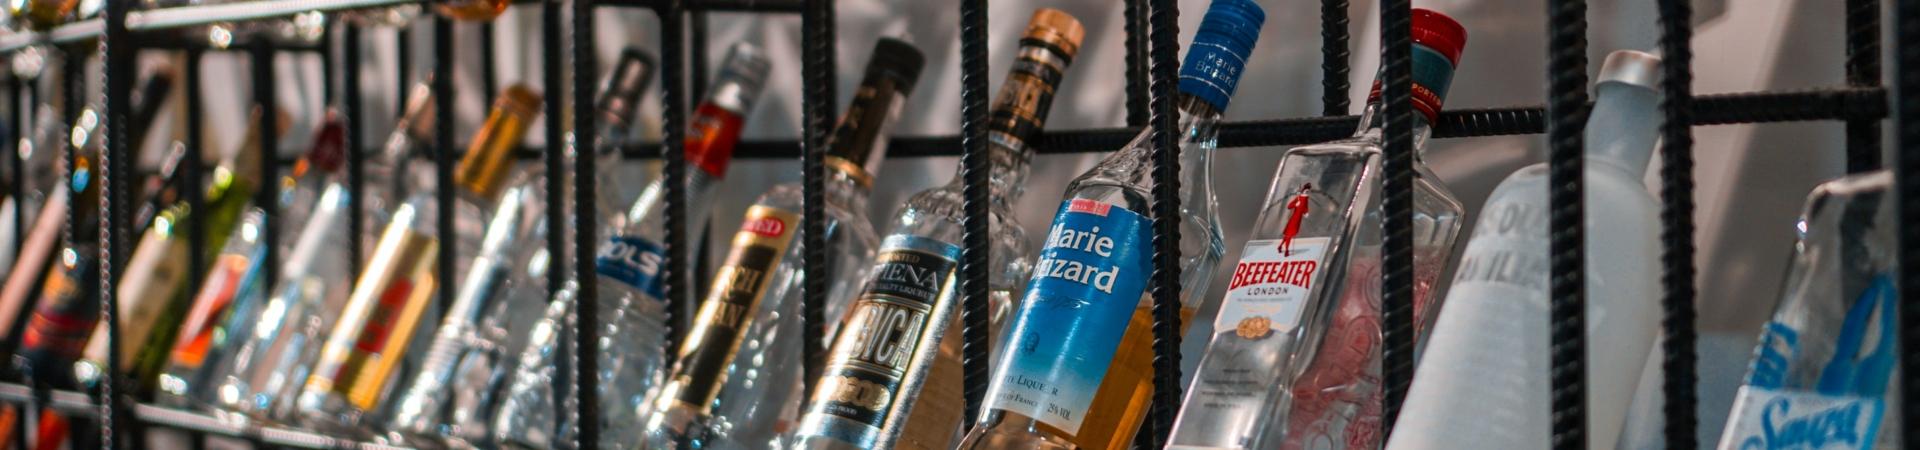 alcohol branding marketing strategies